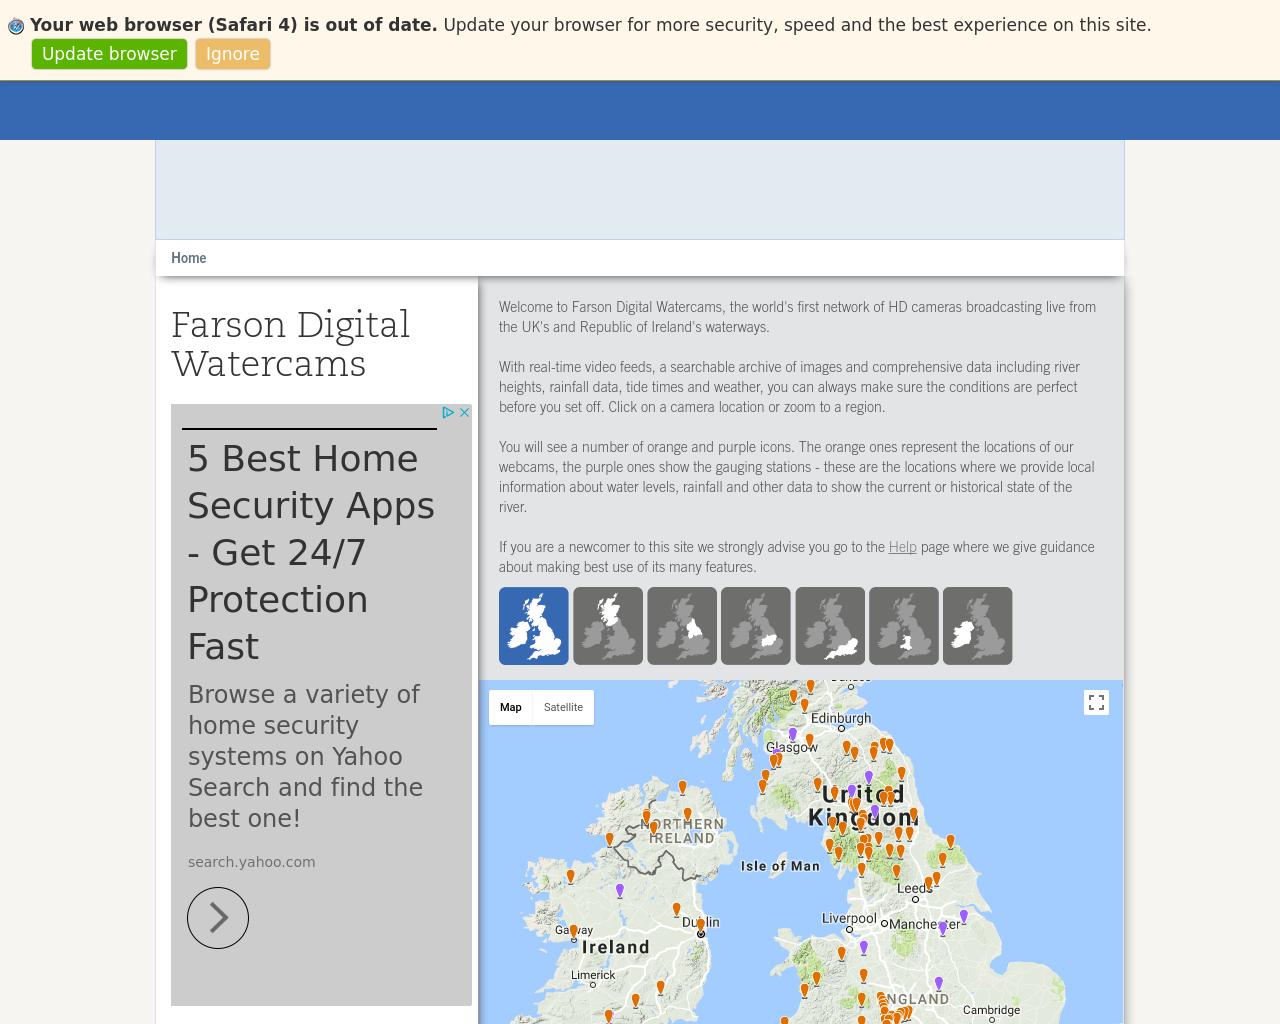 Farson-Digital-Watercams-Advertising-Reviews-Pricing